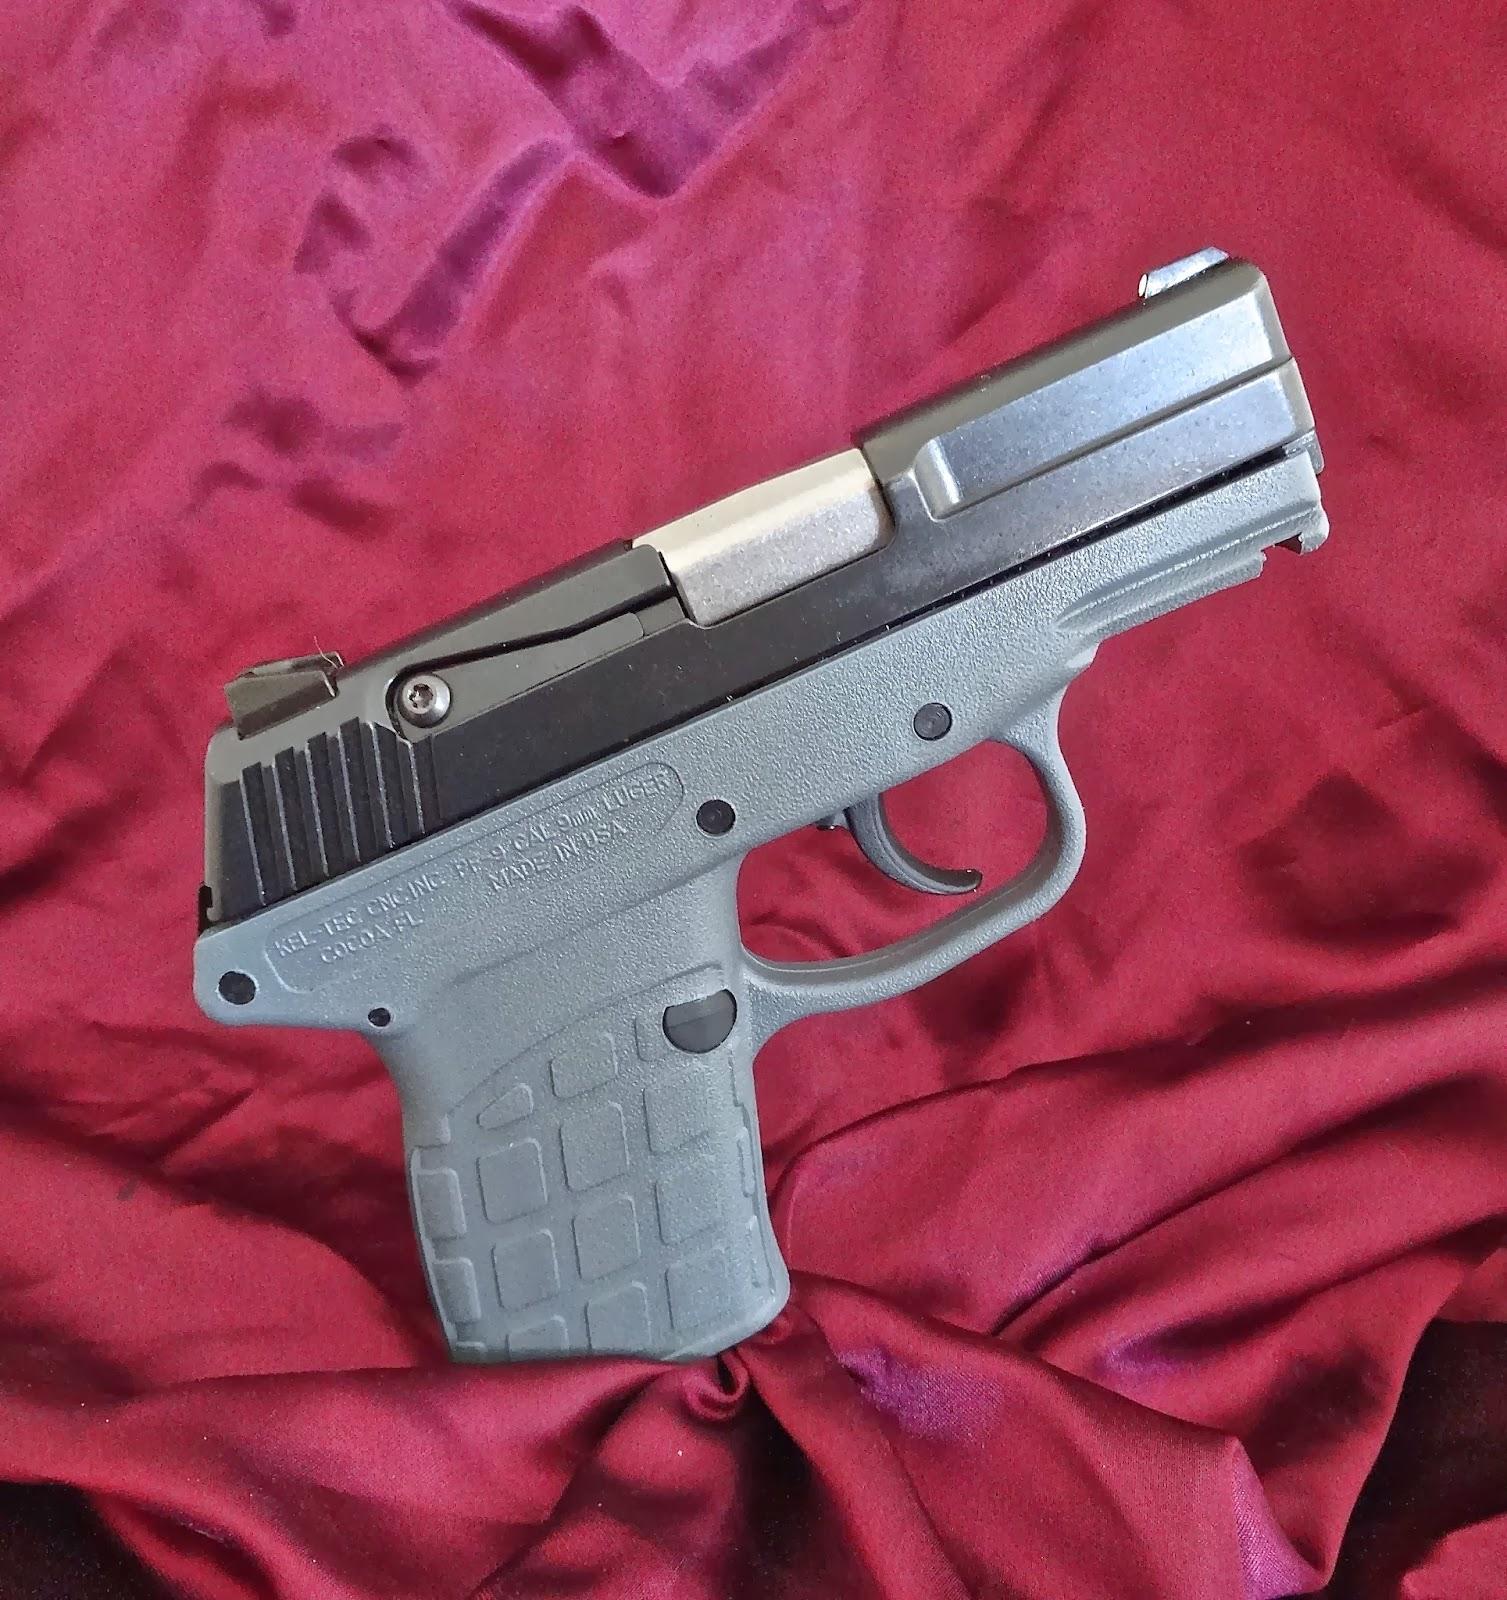 Average Joe's Handgun Reviews: Kel-Tec PF9 9mm